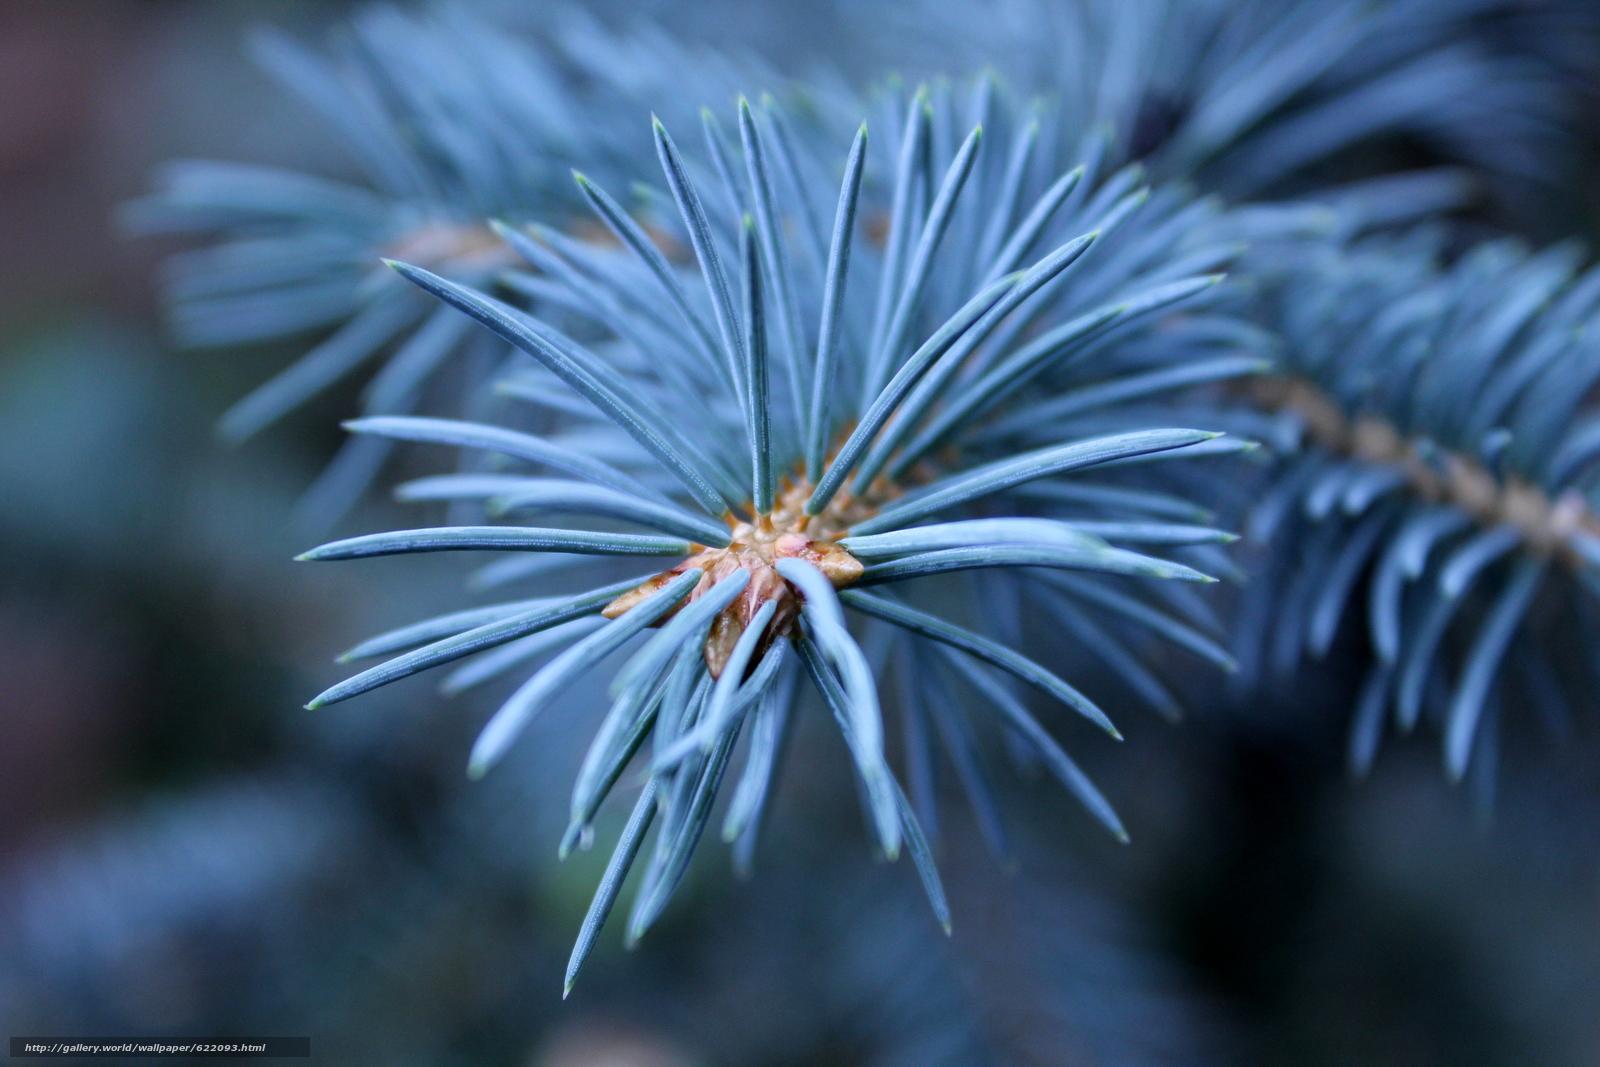 Download wallpaper pine,  branch,  needles,  Macro free desktop wallpaper in the resolution 5184x3456 — picture №622093